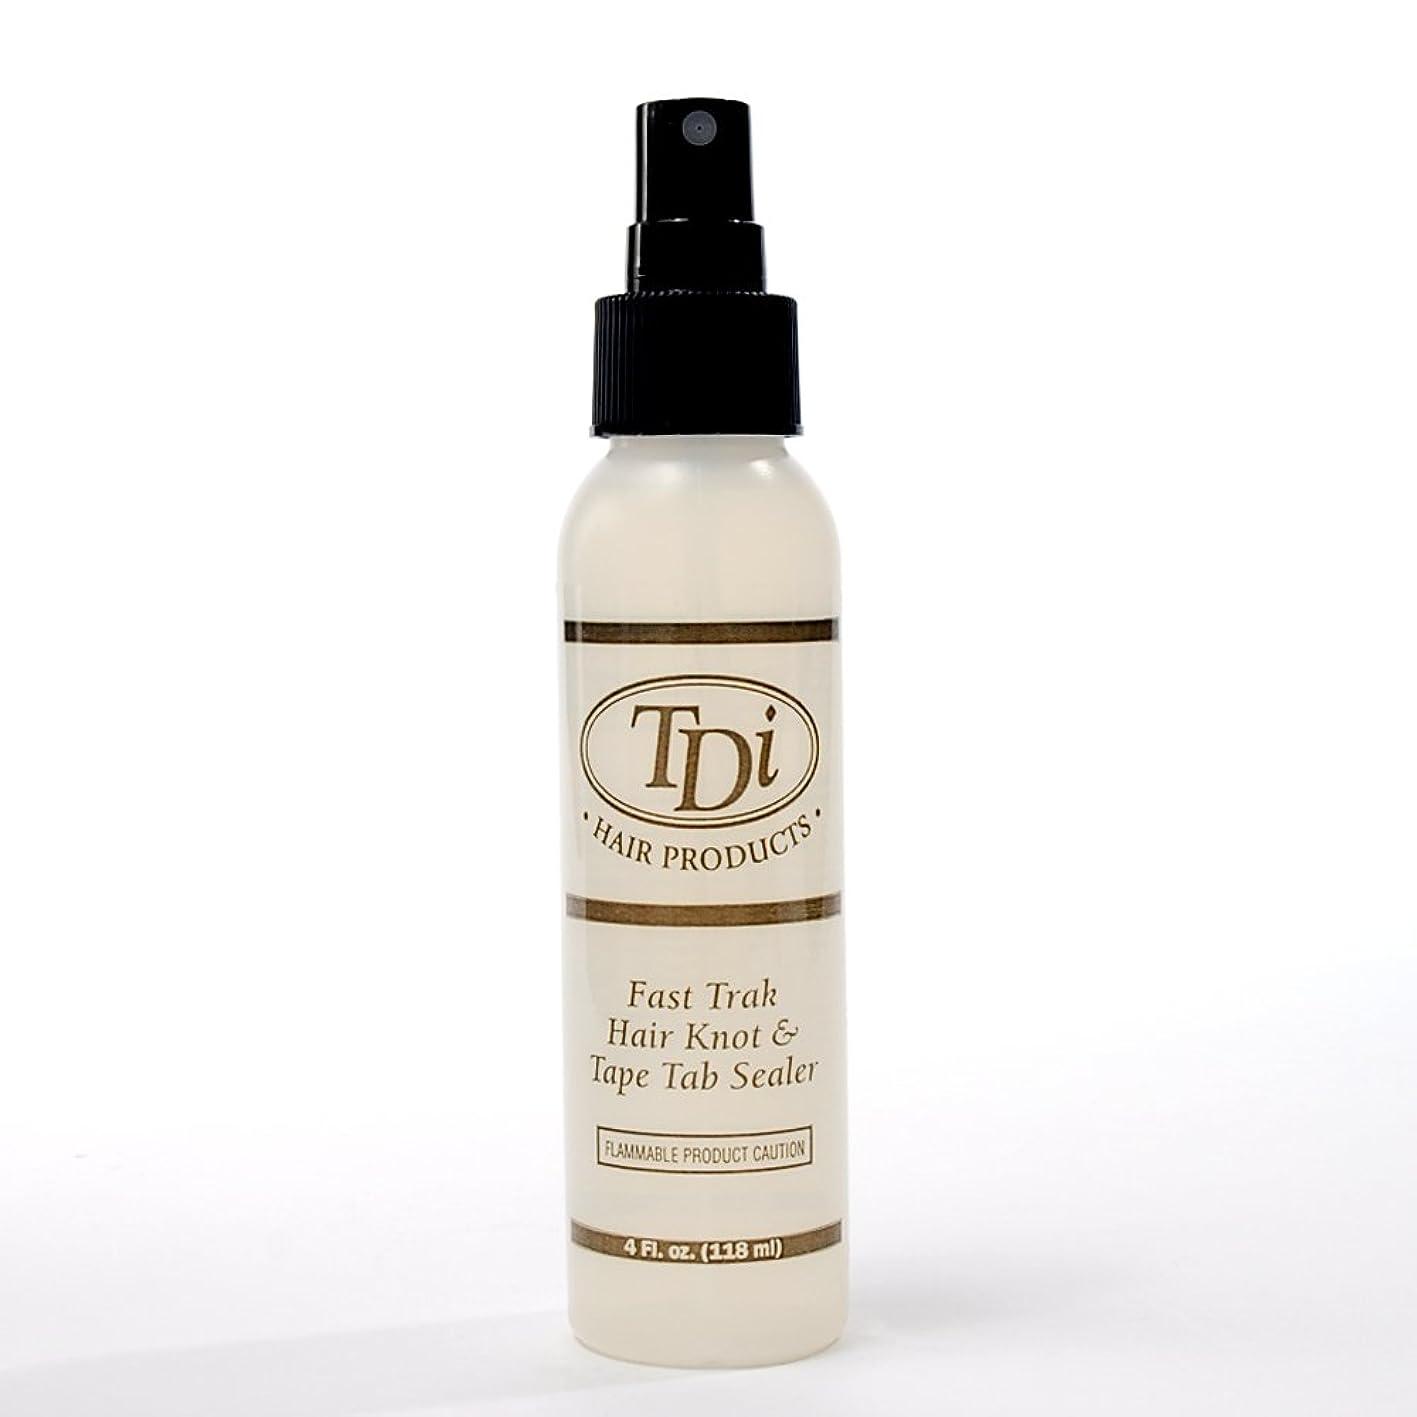 TDI Hair Knot Sealer 4.0 oz dqdcghldwyp050